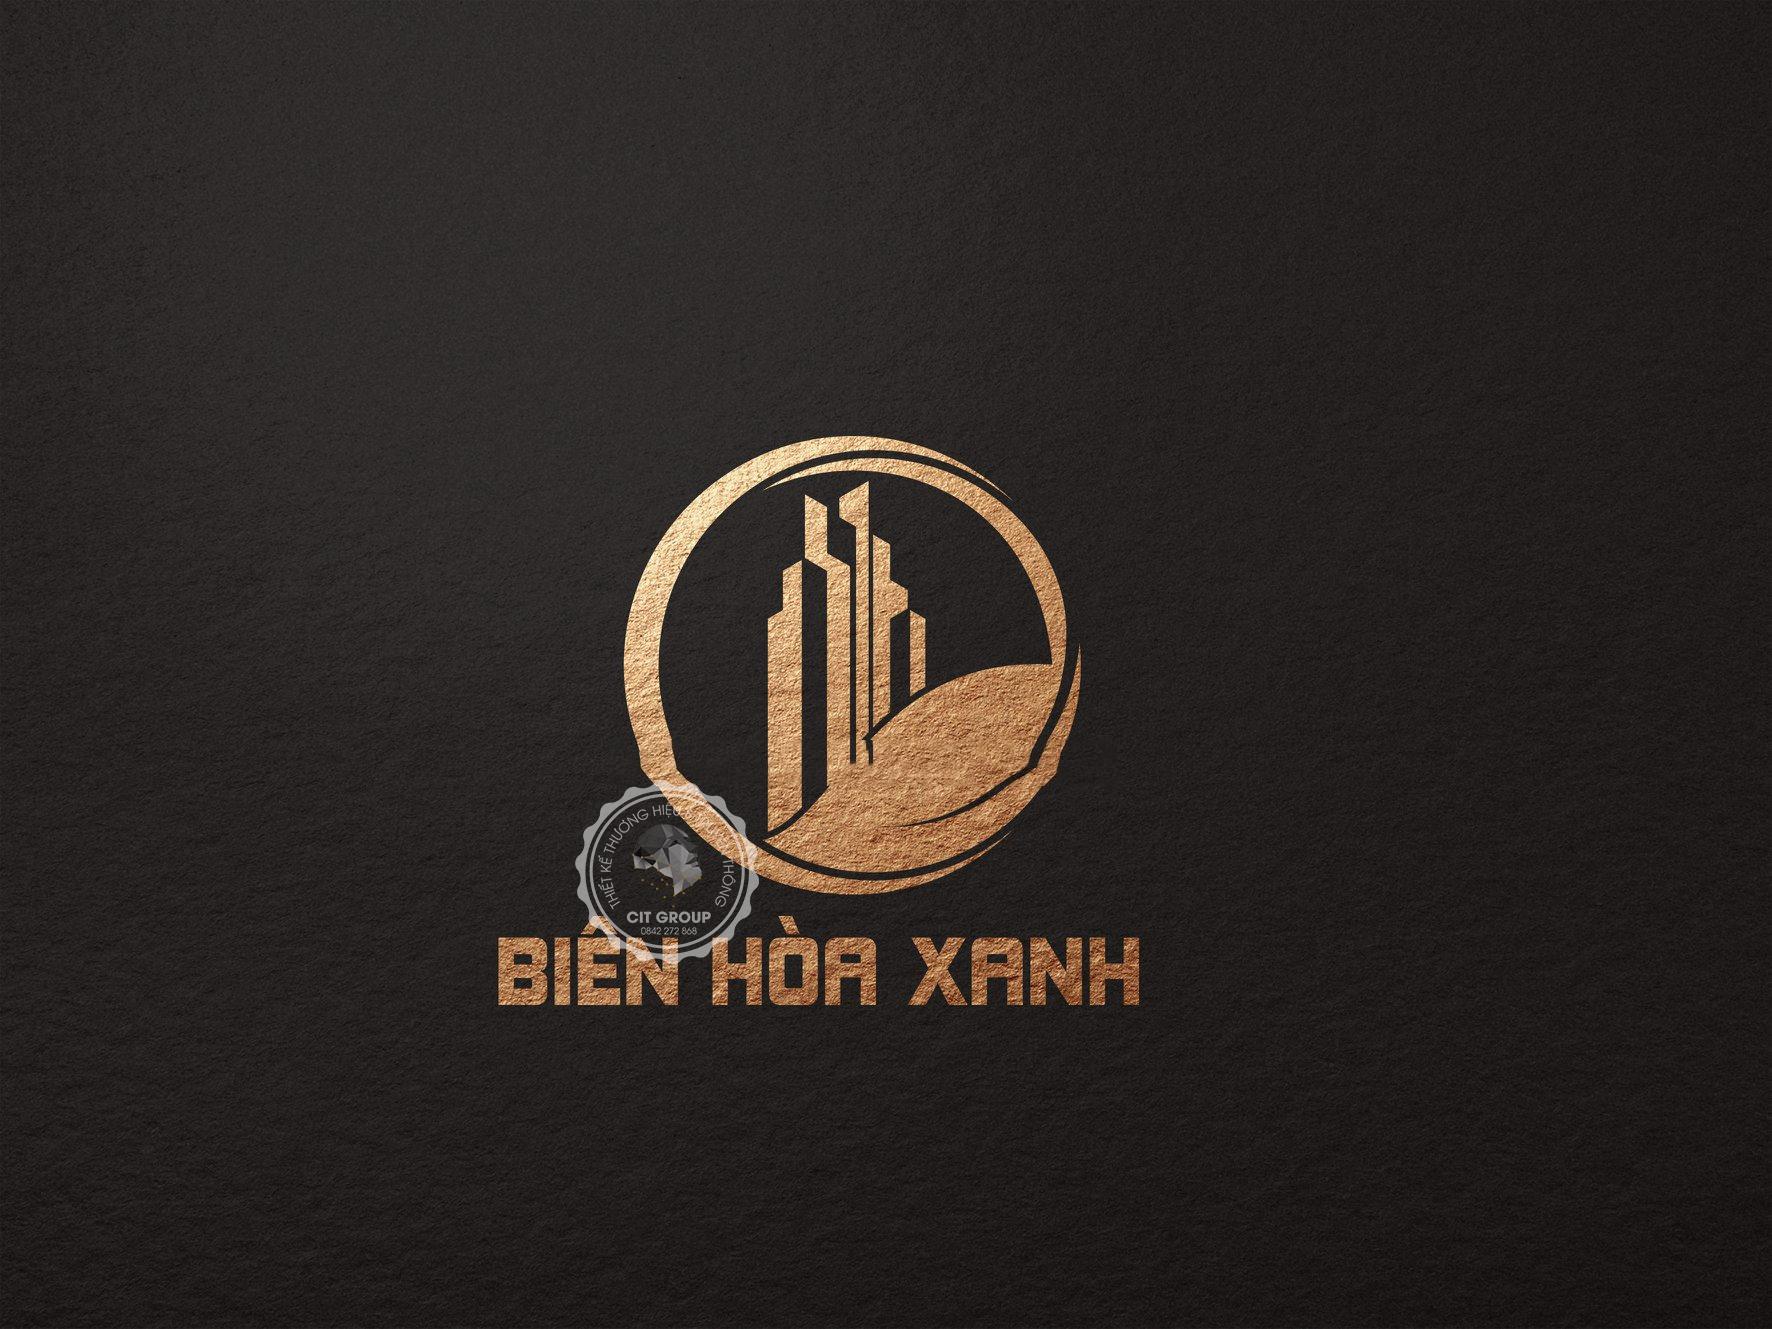 logo ve sinh cong nghiep bien hoa xanh